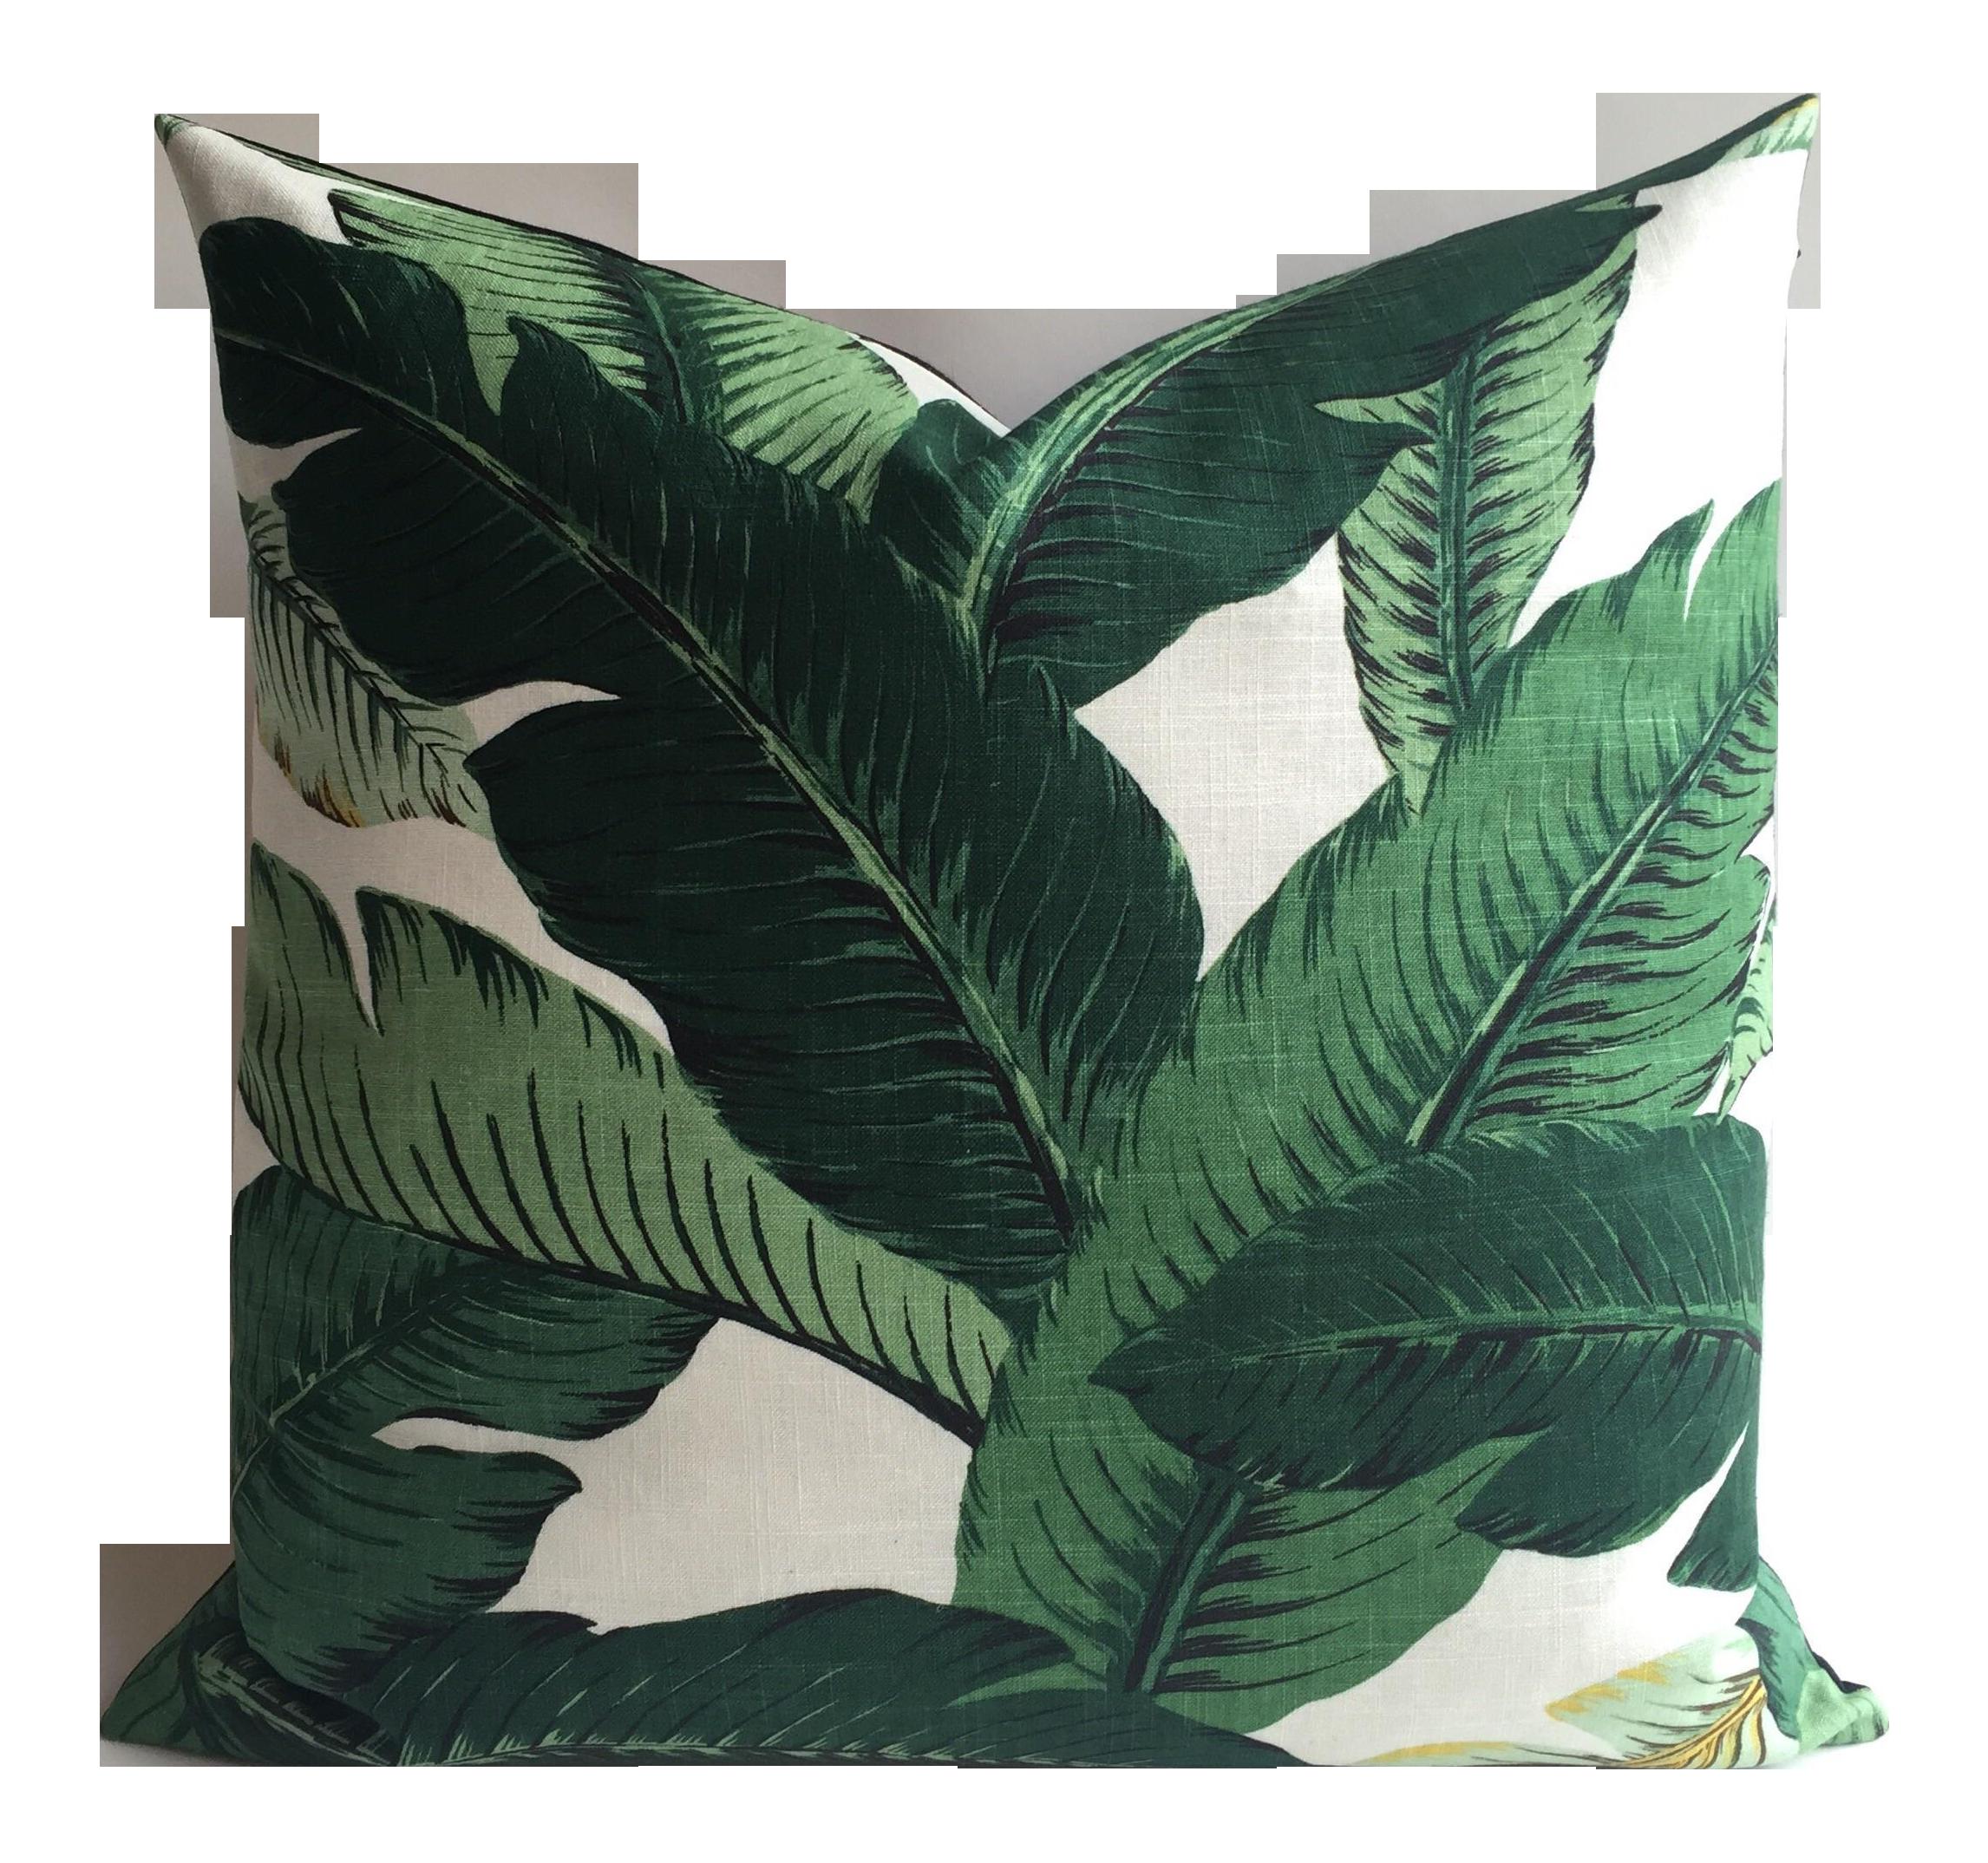 Pin by Dan Appel on 2321 Banana leaf pillow, Pillow